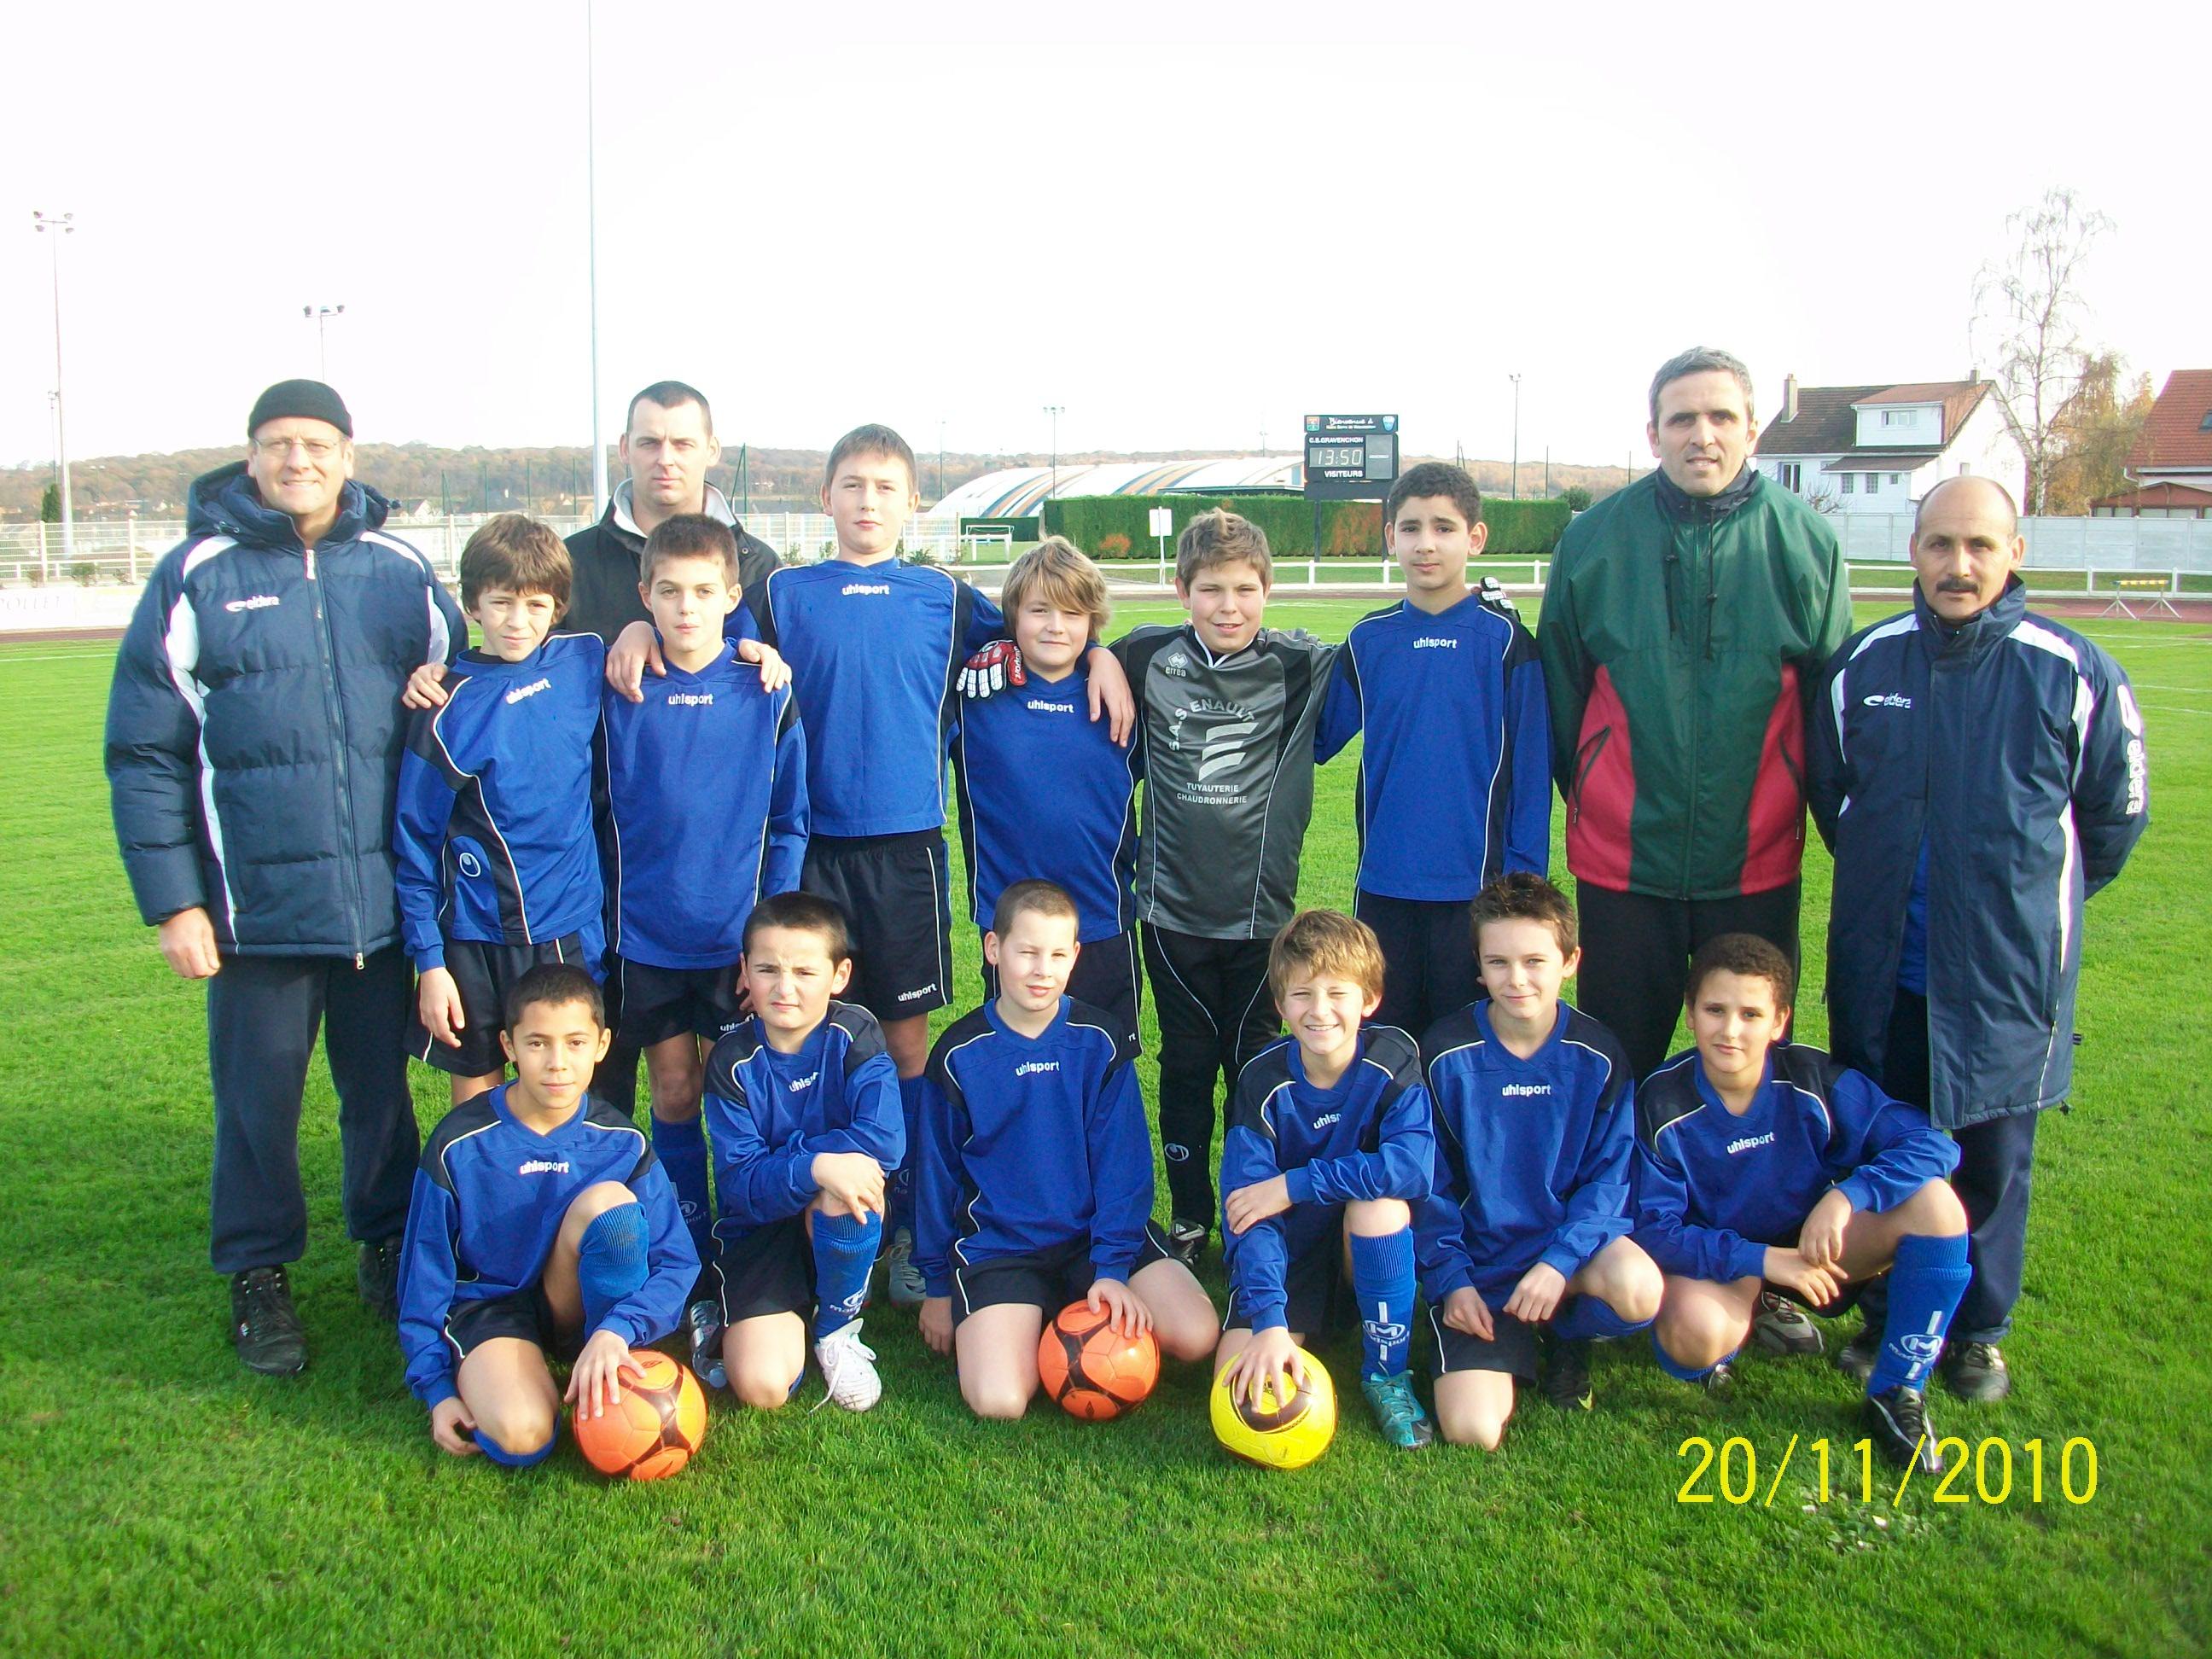 Les U13 Du Csg Football Club Football Cs Gravenchon Foot